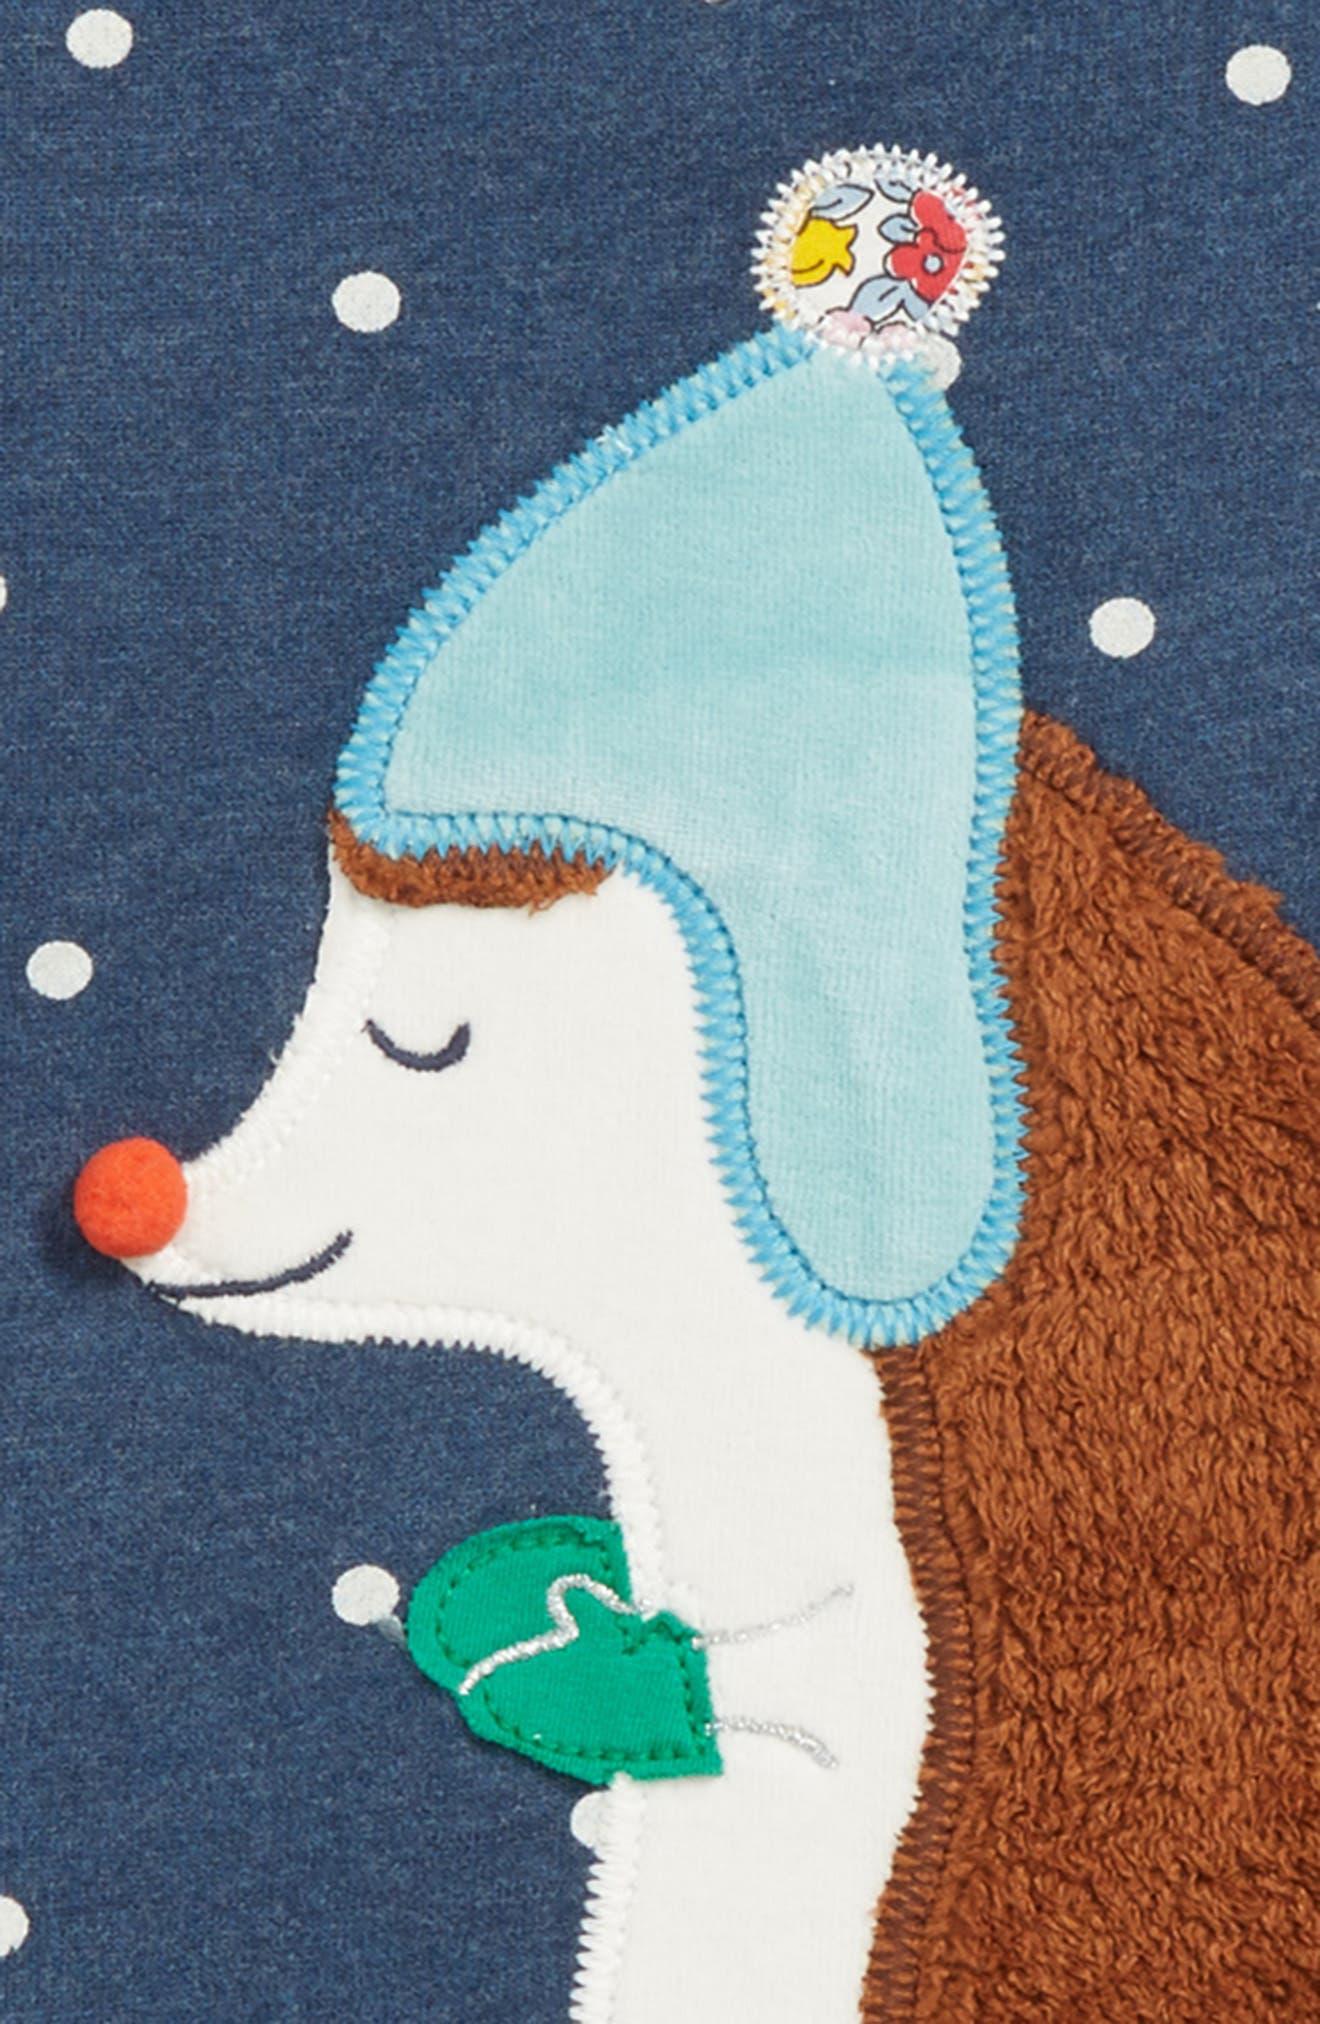 Mini Boden Fluffy Friends Sweatshirt,                             Alternate thumbnail 2, color,                             SCHOOL NAVY HEDGEHOG